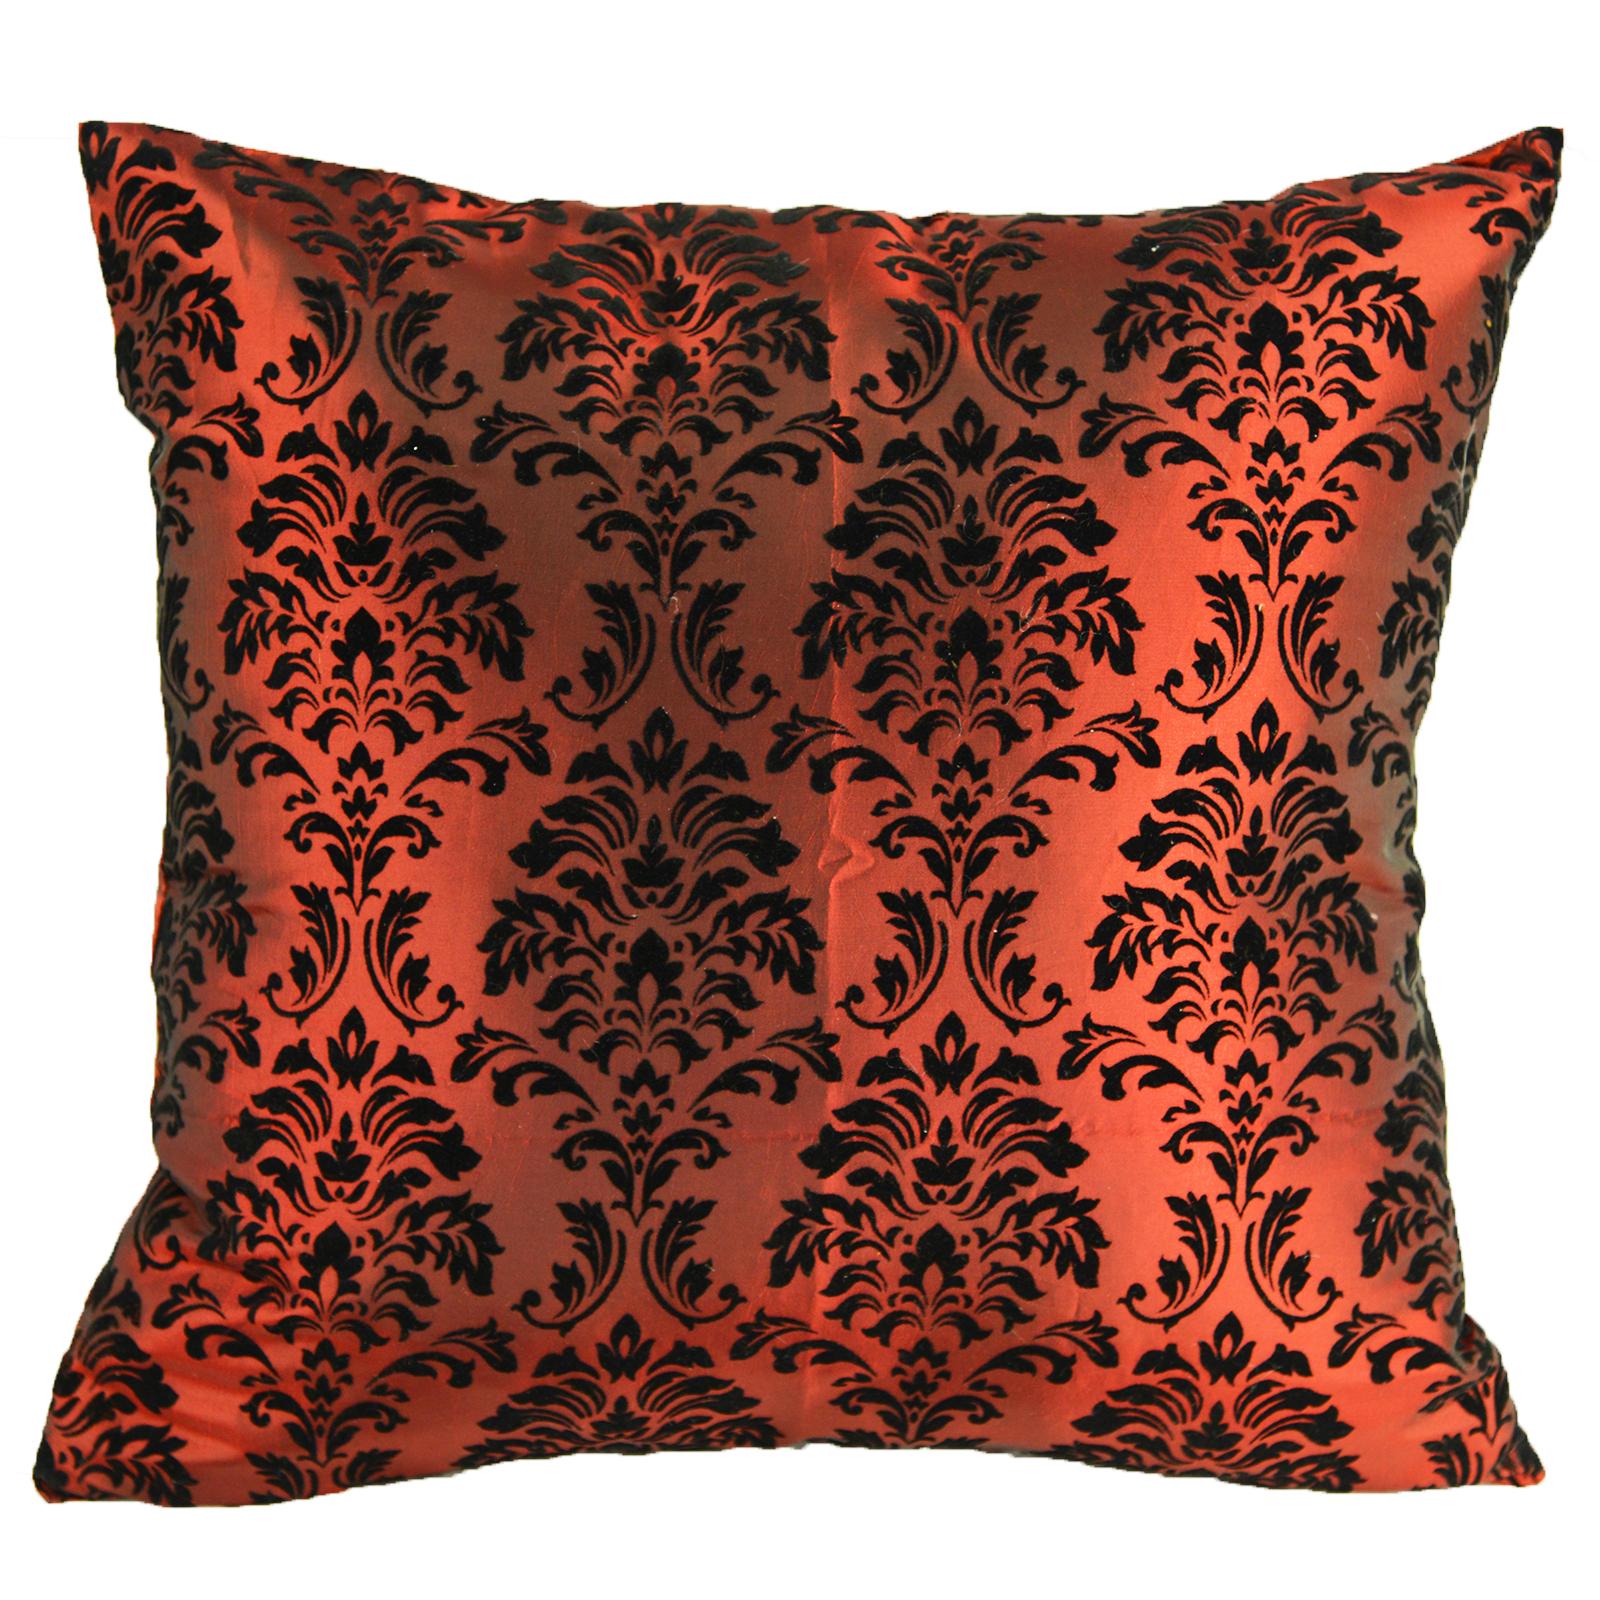 kissenh lle sofakissen kopfkissen kissenbezug kissen h lle bez ge 40x40 148 ebay. Black Bedroom Furniture Sets. Home Design Ideas